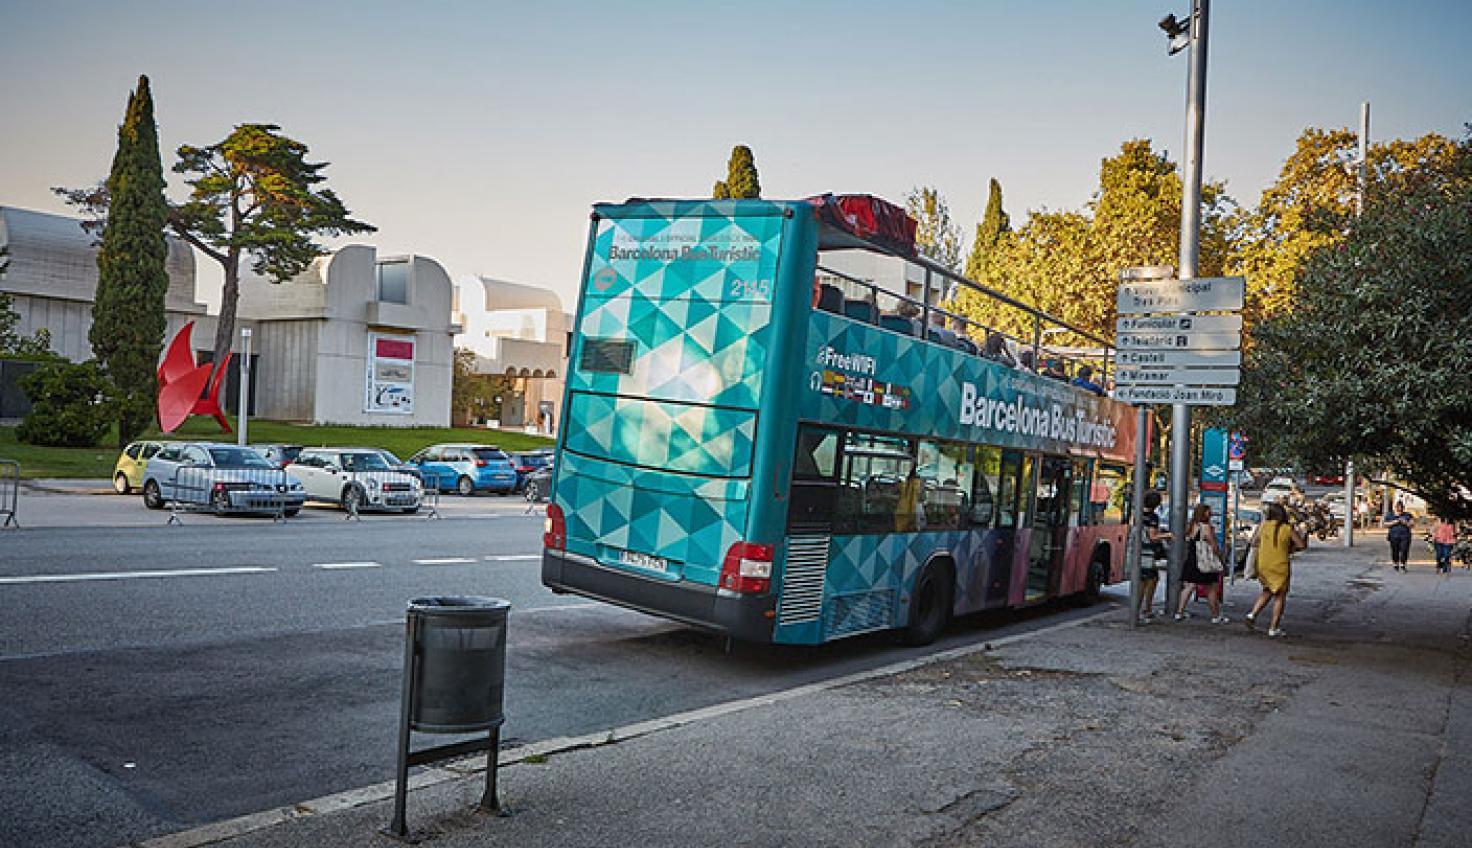 Fermata Fondazione Joan Miró